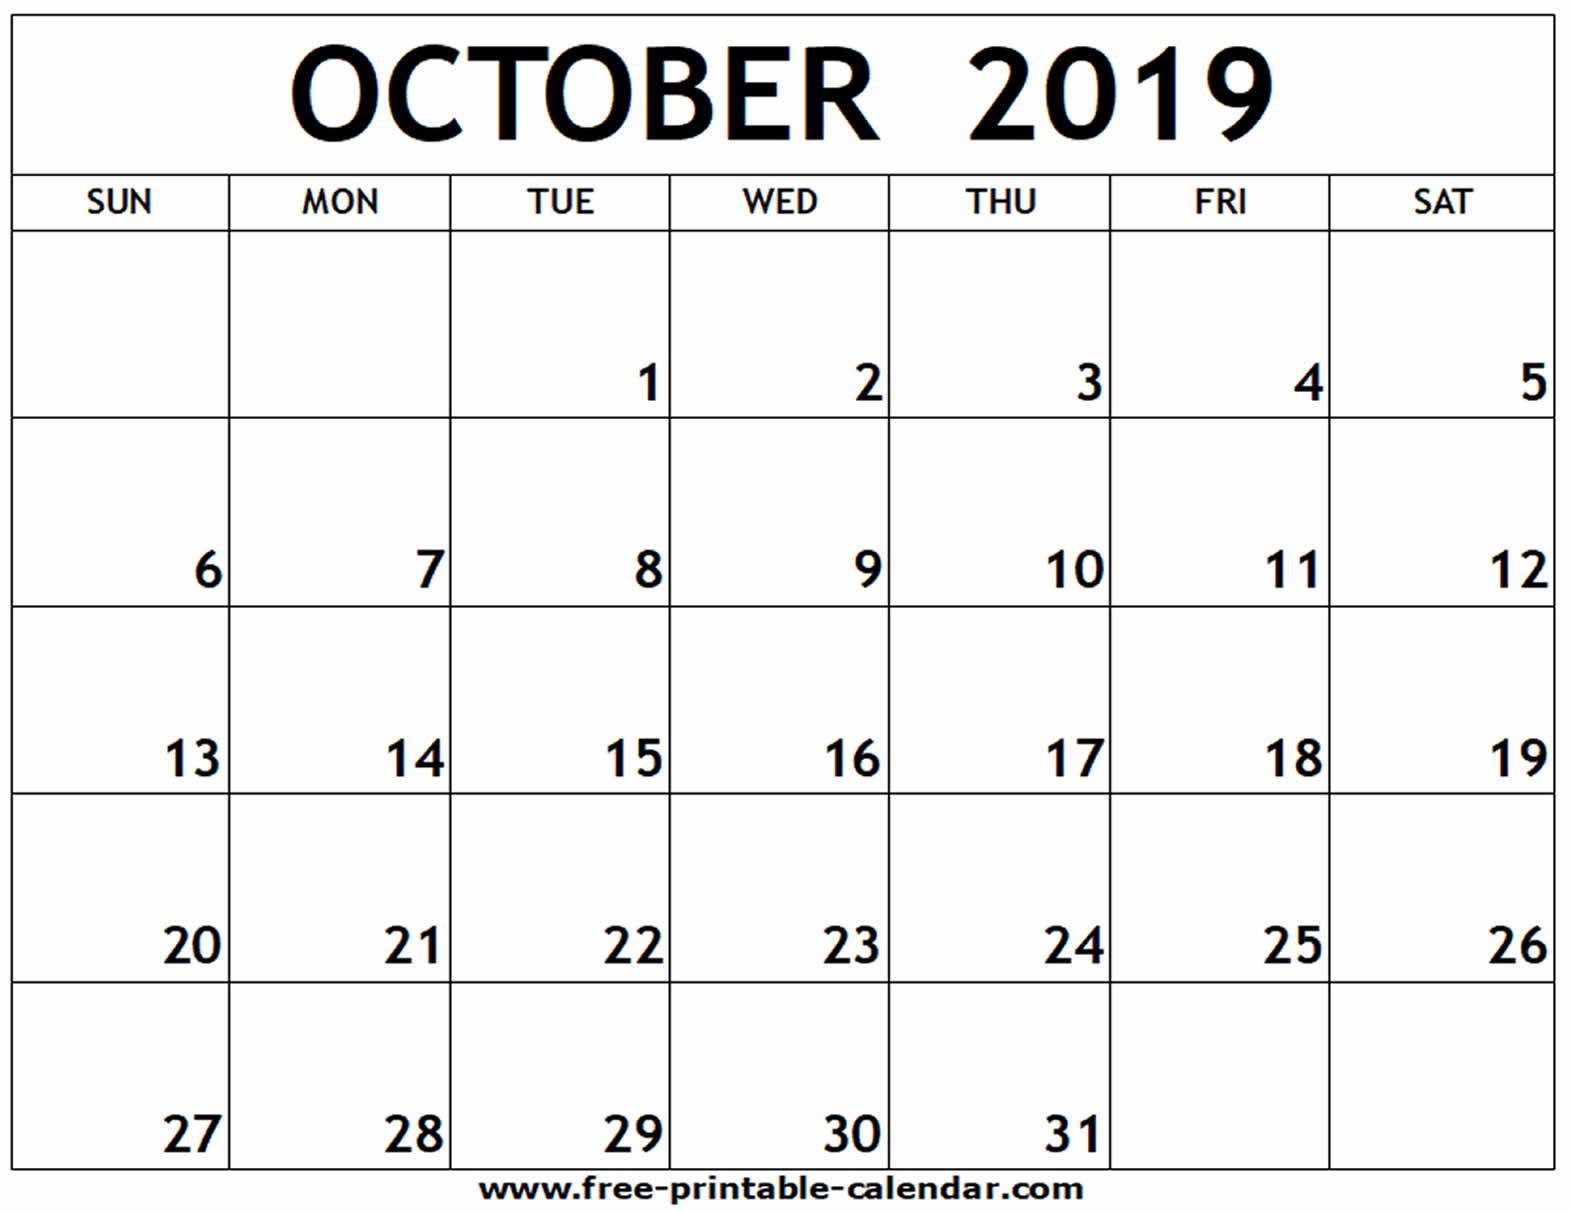 October 2019 Printable Calendar - Free-Printable-Calendar for Calendar October 2019 Australia Images